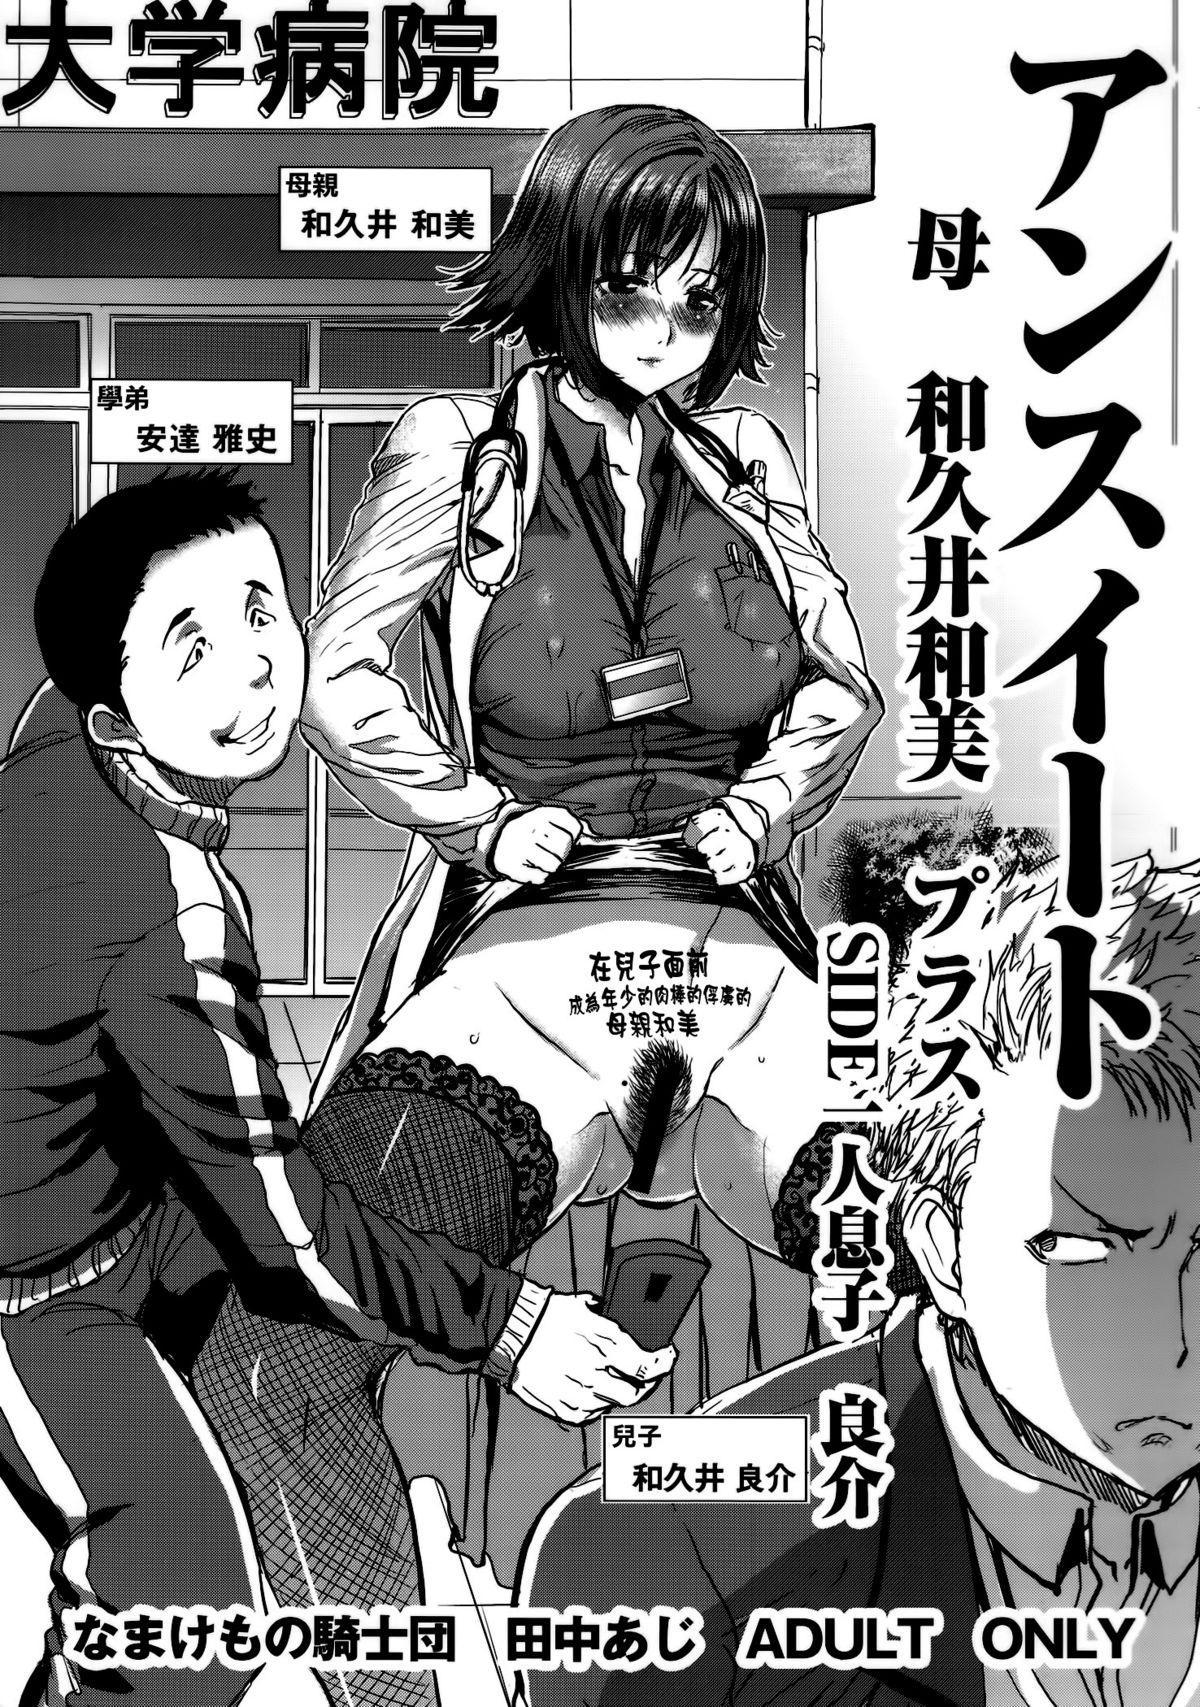 UnSweet Haha Wakui Kazumi Plus SIDE Hitori Musuko Ryousuke   Unsweet Mom Aimi Wakui - SIDE her only son Yoshisuke 0